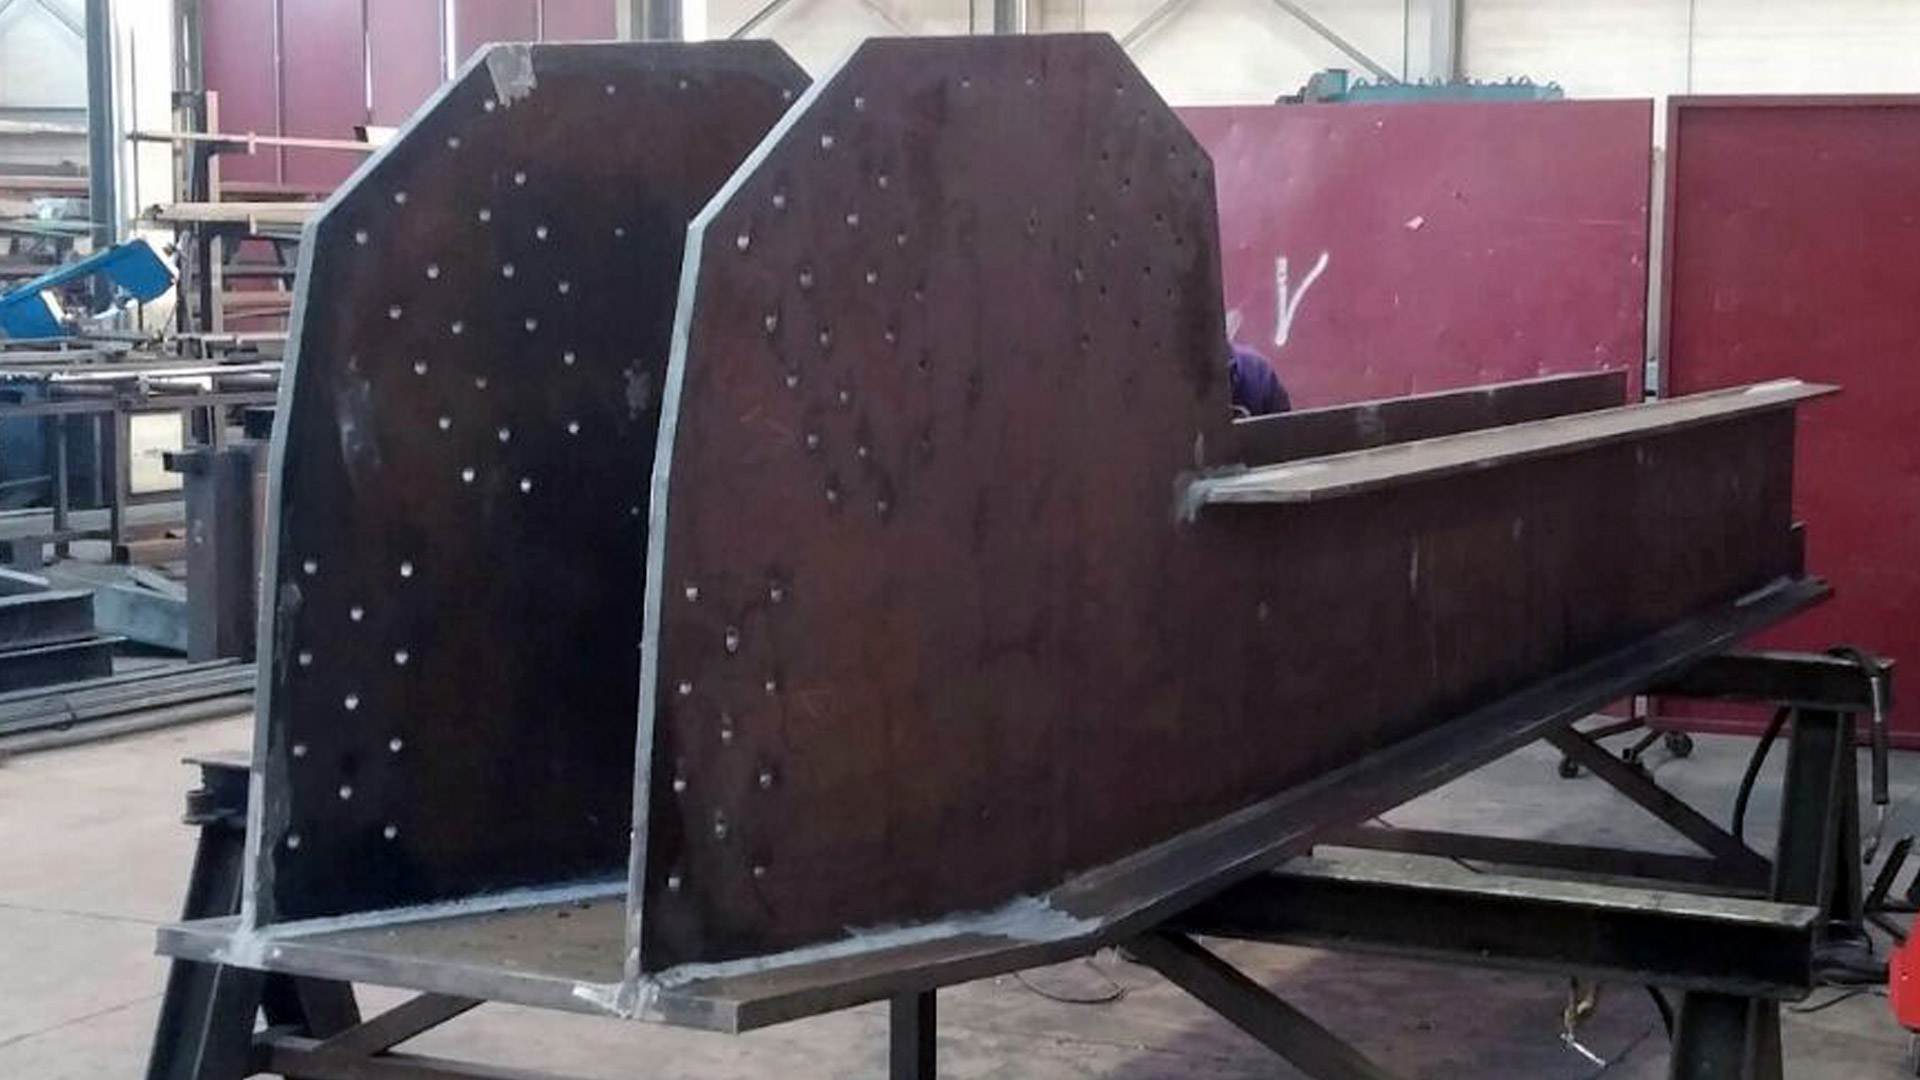 ponte-portella-trave-congiunzione-carpenteria-civile-industriale-metal-engineering-2